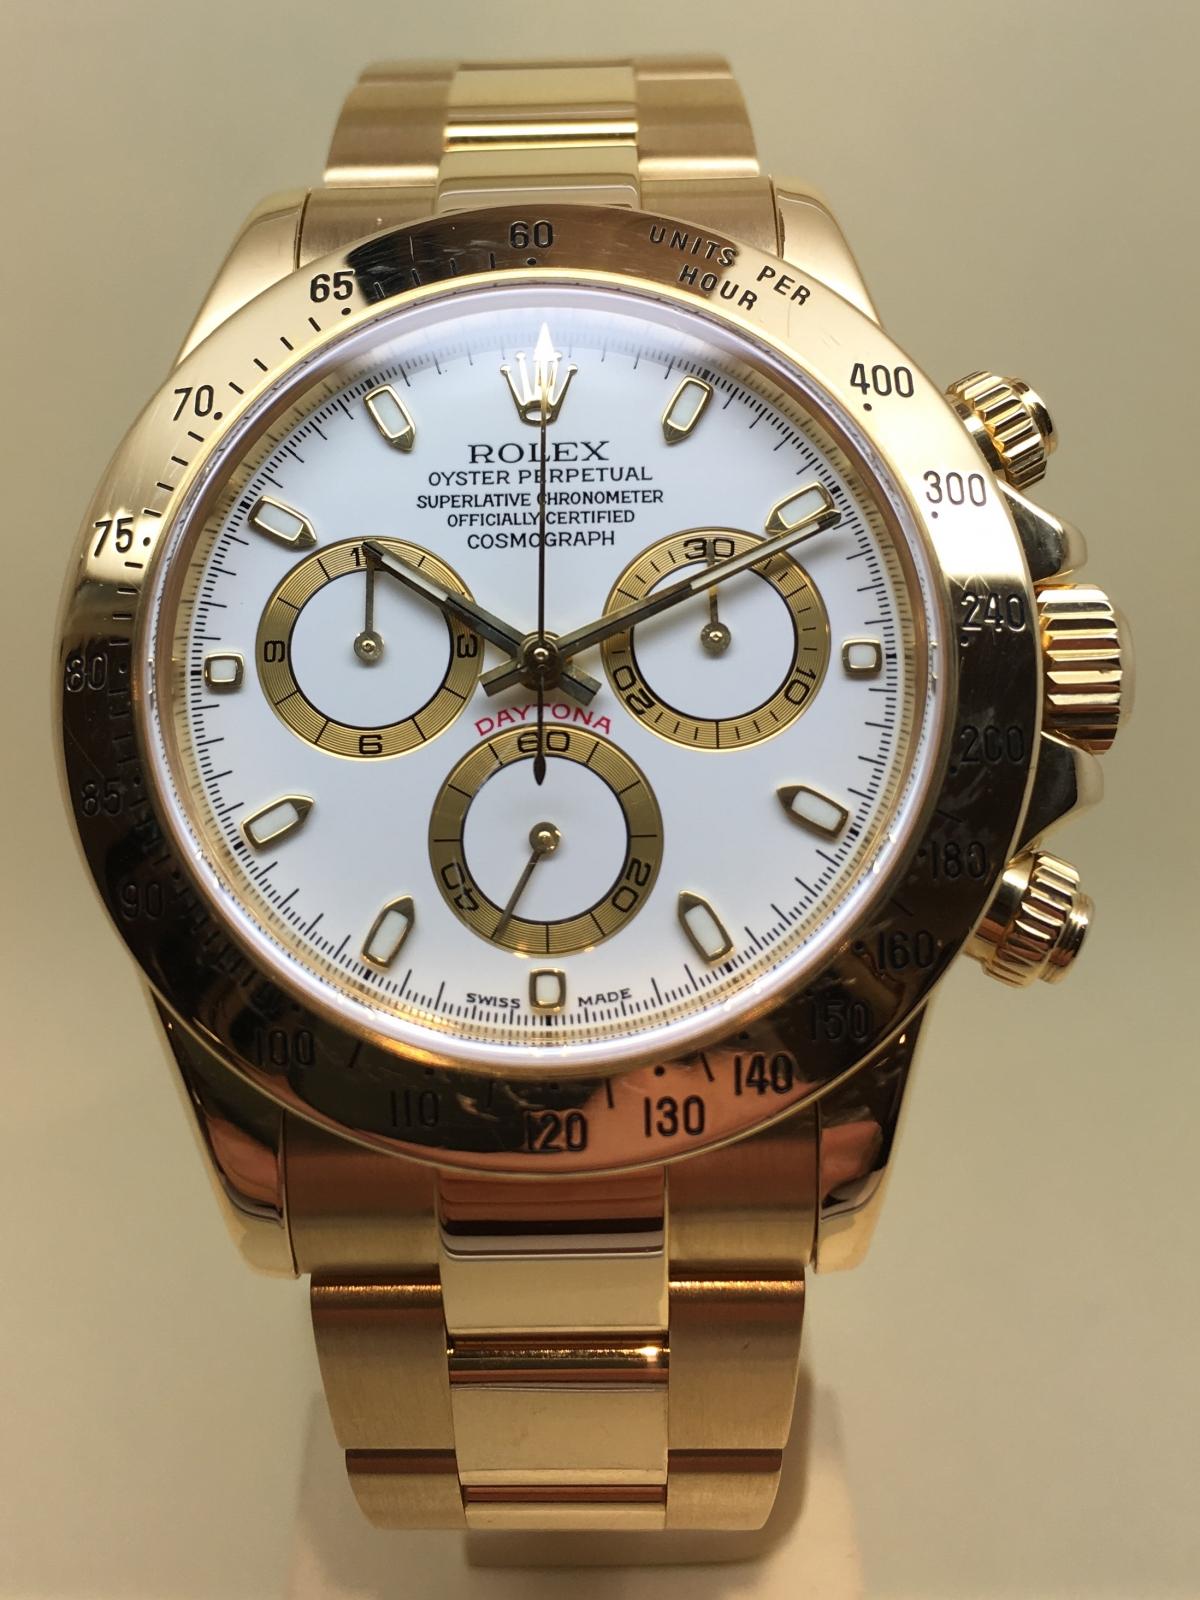 Carter Marsh Co Ltd Antique Clocks Rolex Cosmograph Daytona